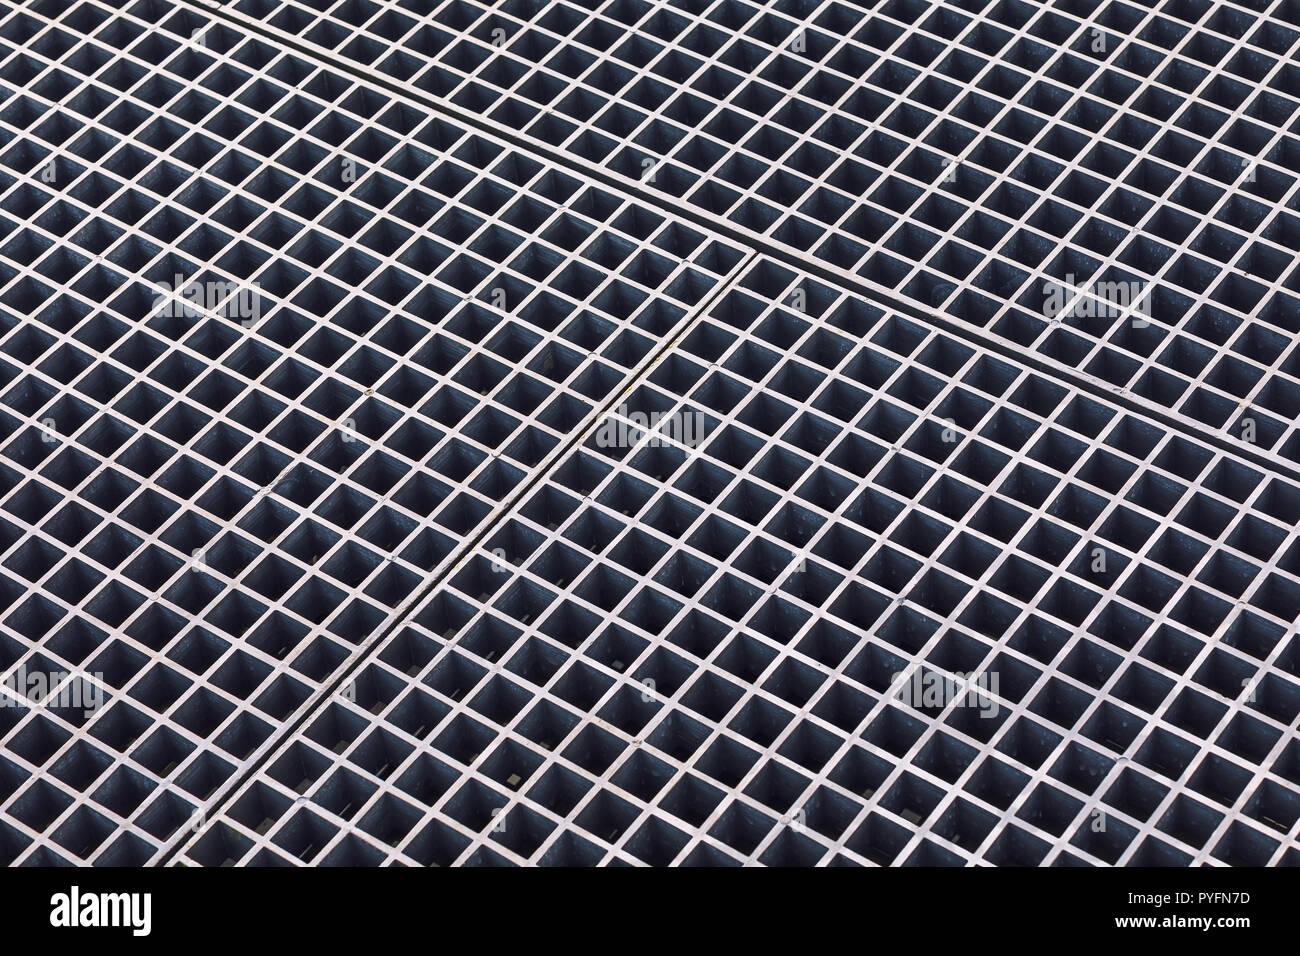 Stainless steel metal lattice texture - Stock Image